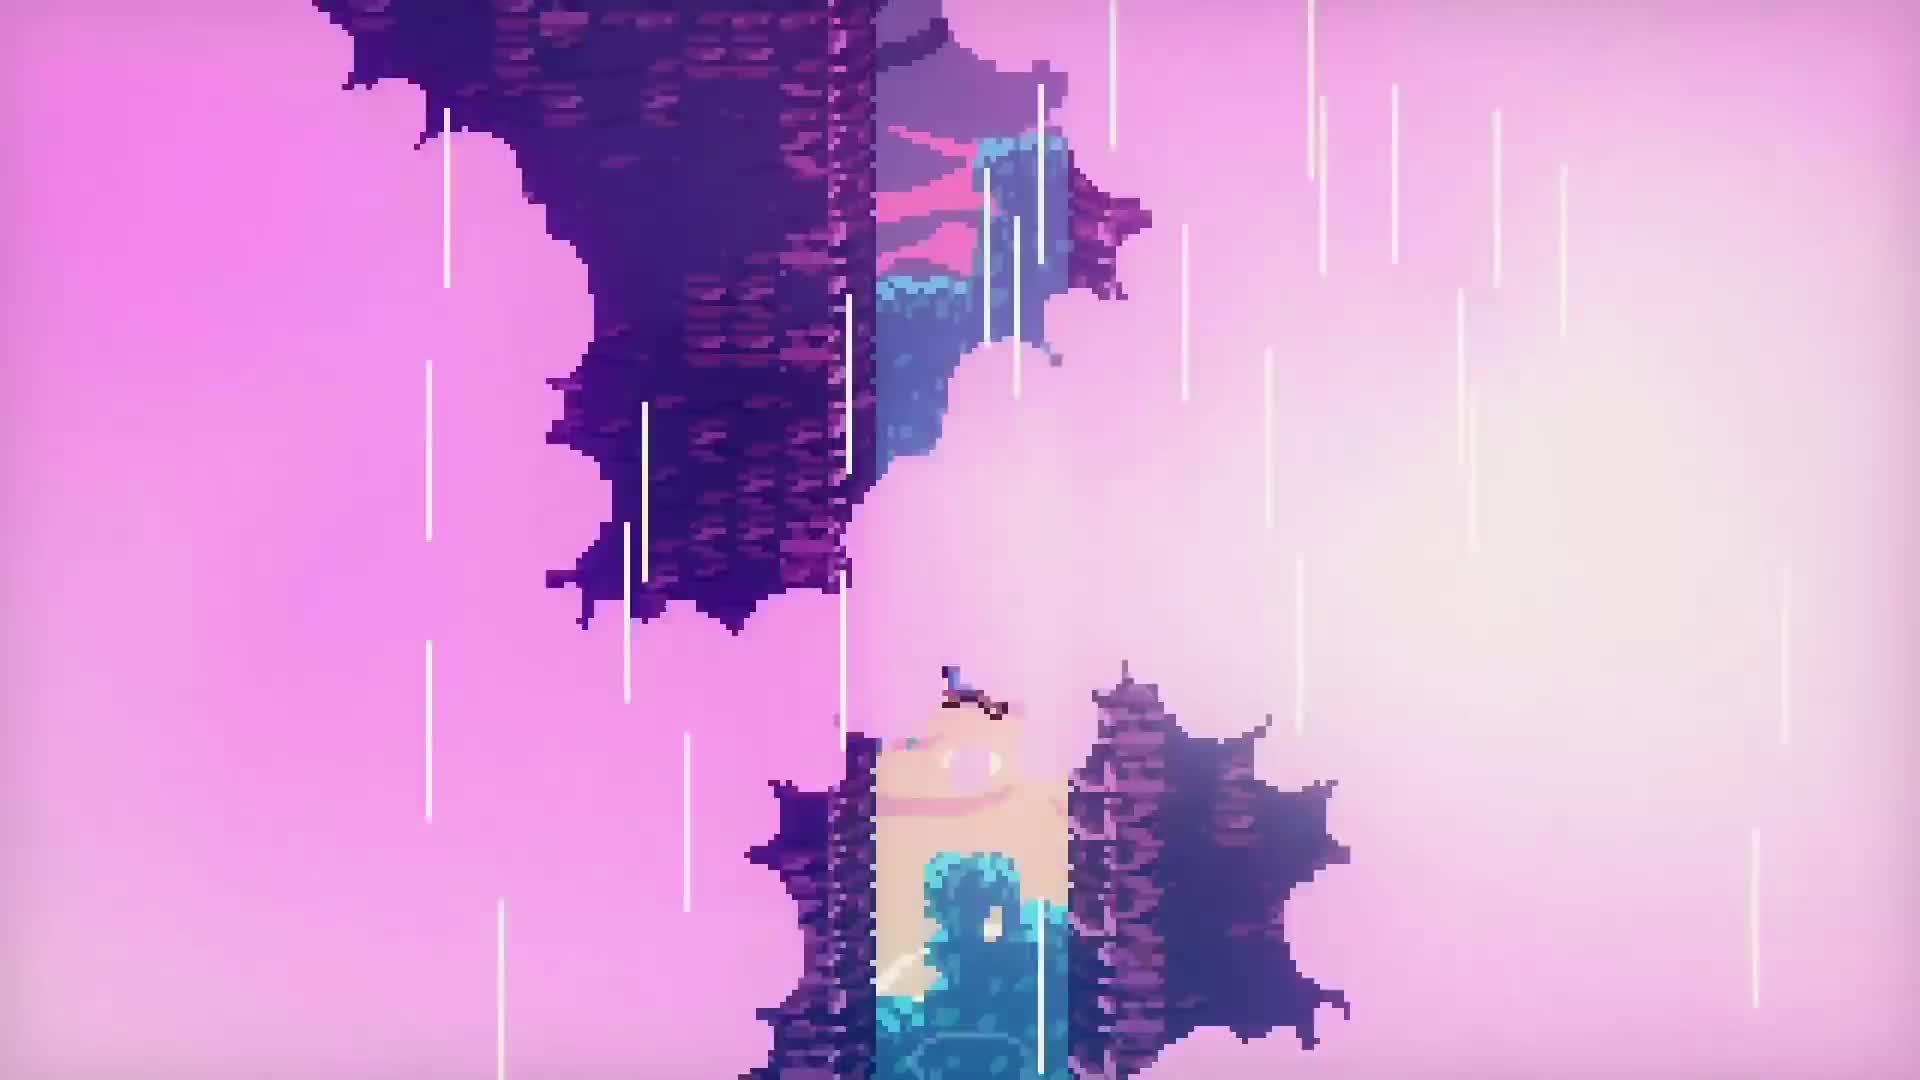 Canada, Celeste, TowerFall, climb, climbing, difficult, hardcore, indie, mountain, platformer, Celeste - Launch Trailer | PS4 GIFs